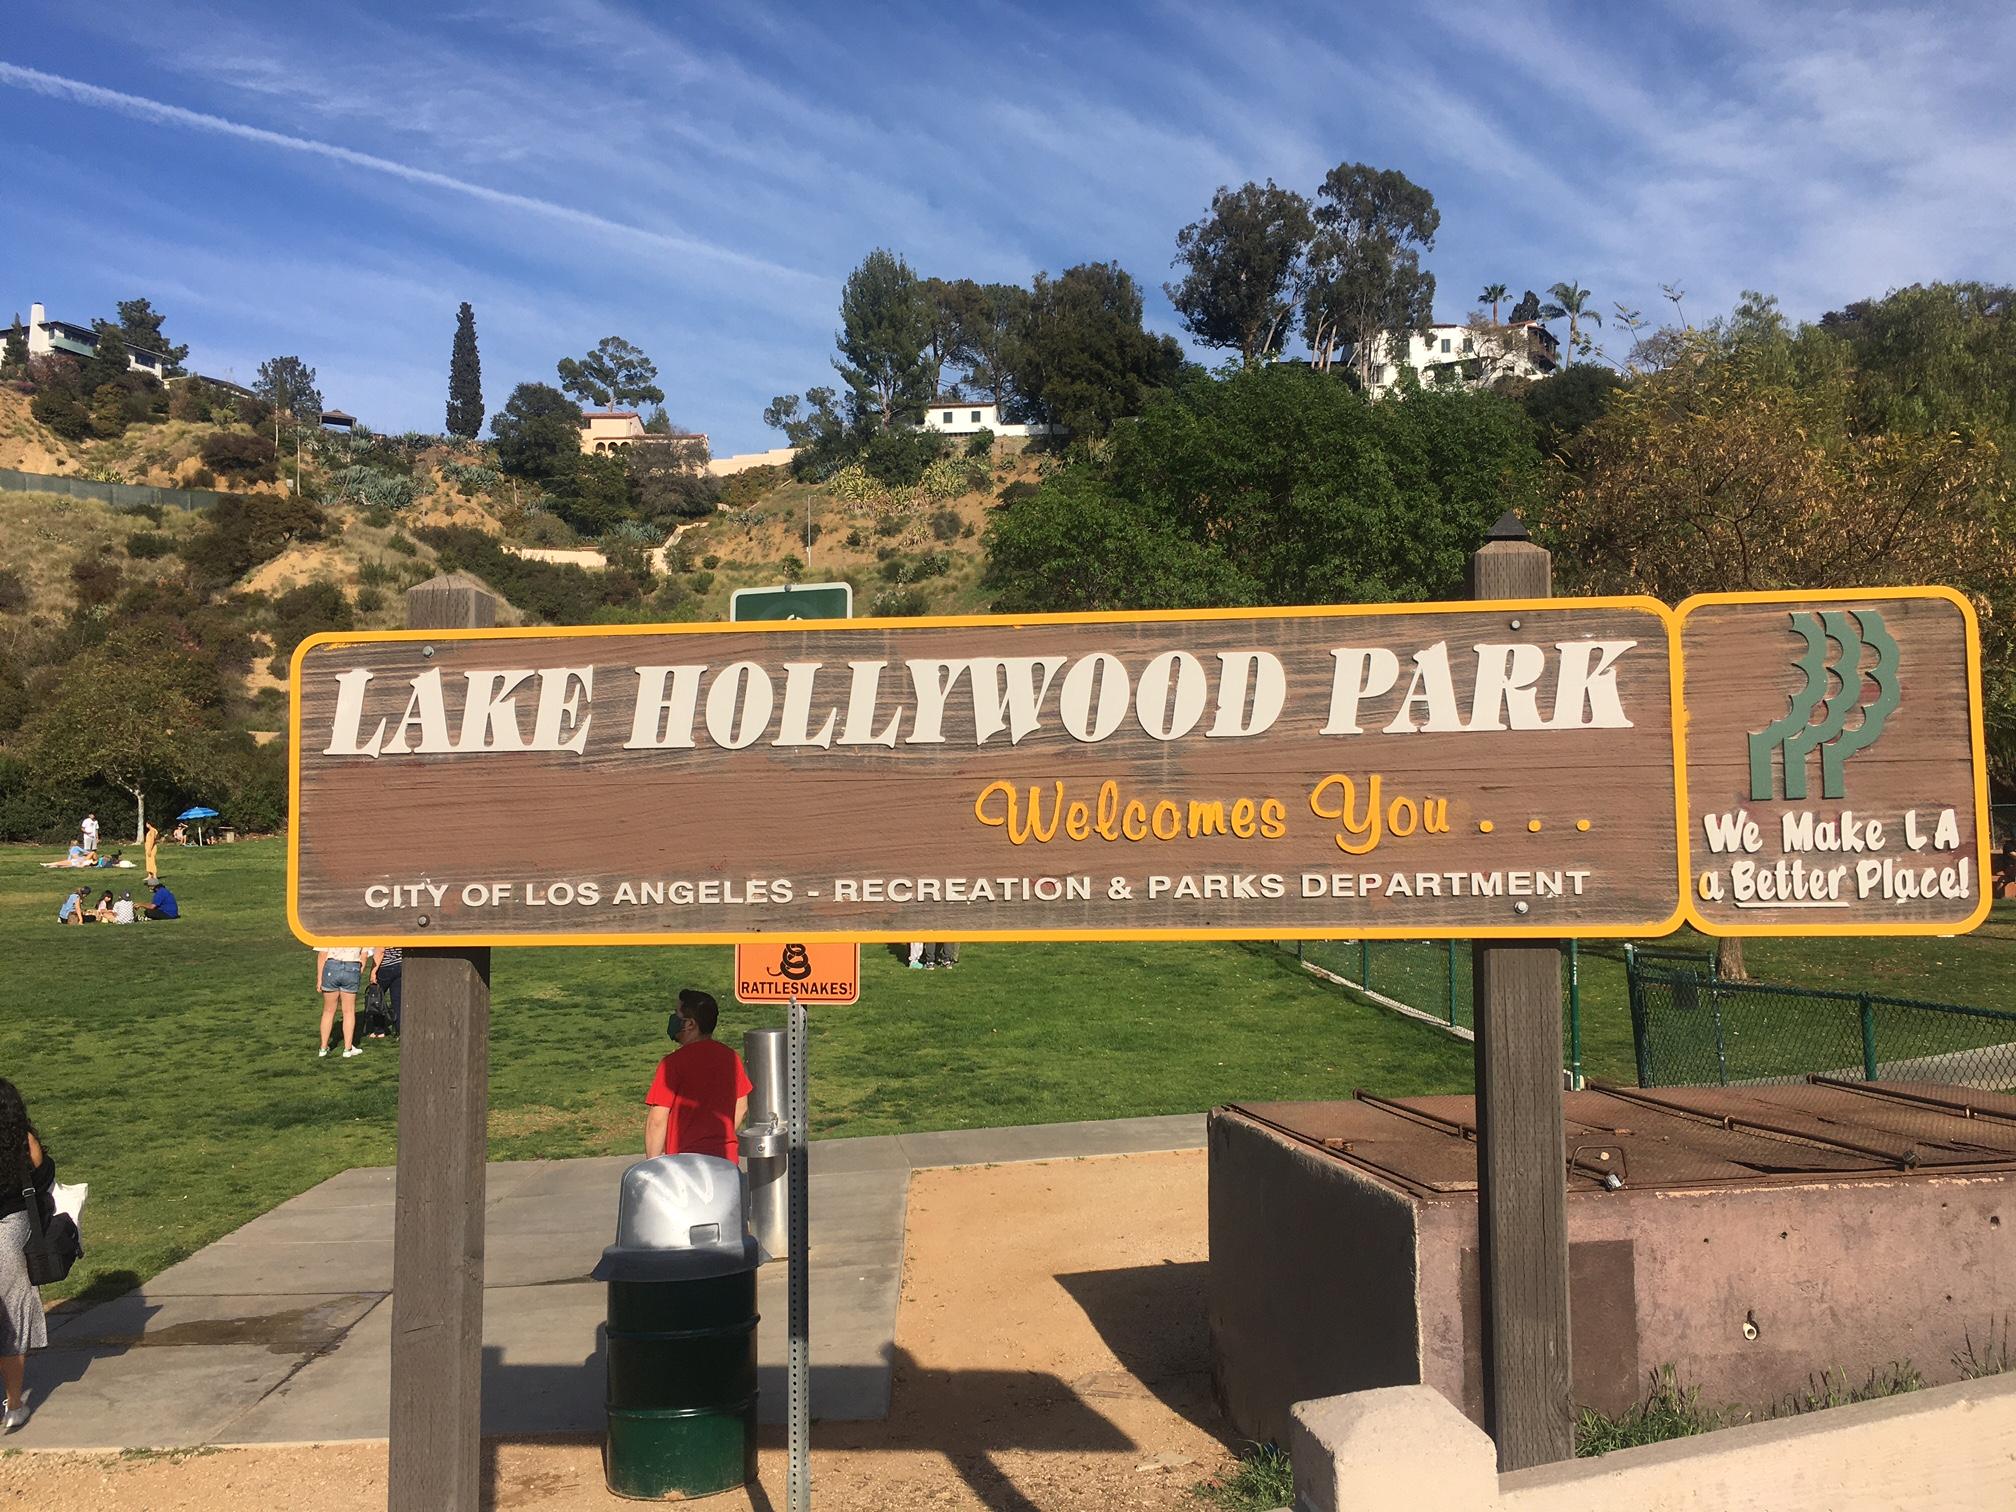 Lake Hollywood Park sign